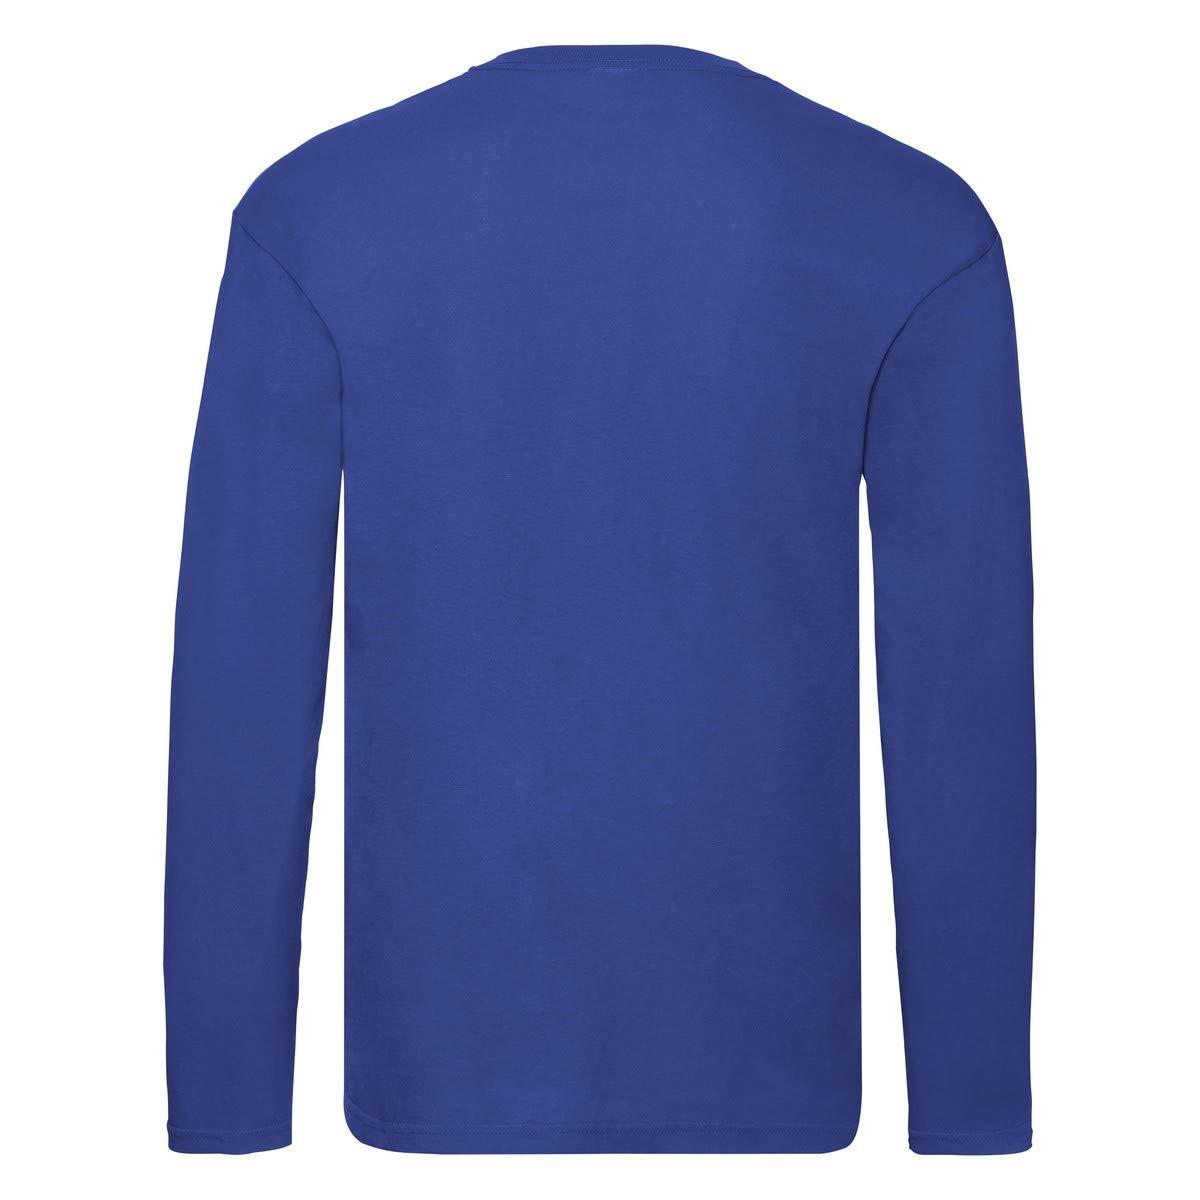 T-Shirt Maniche Lunghe Uomo Maglia 100/% Cotone Fruit of The Loom Original T LS